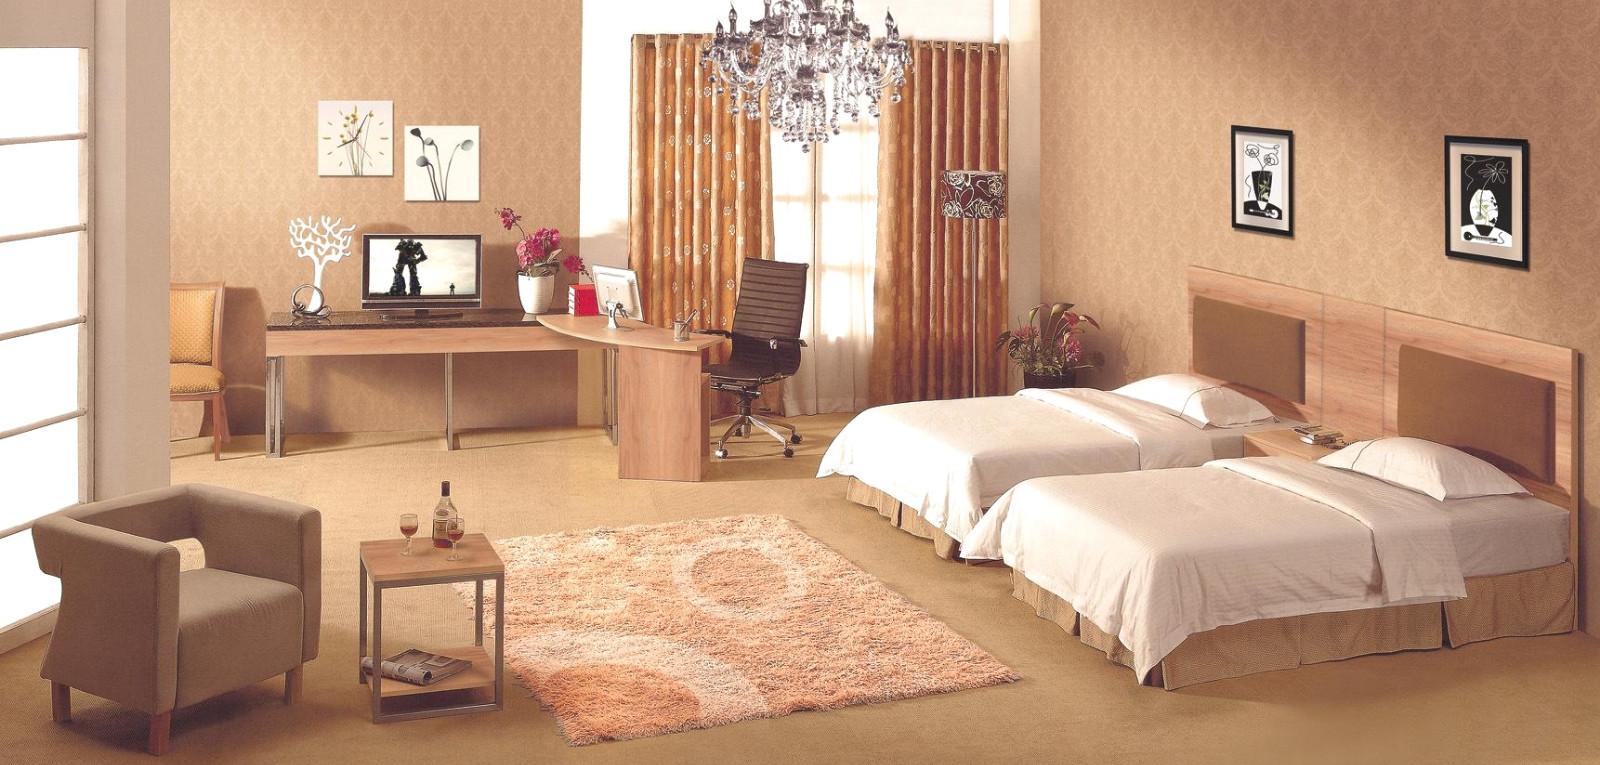 YSK Furniture on-sale hotel furniture outlet near me made for furniture-1